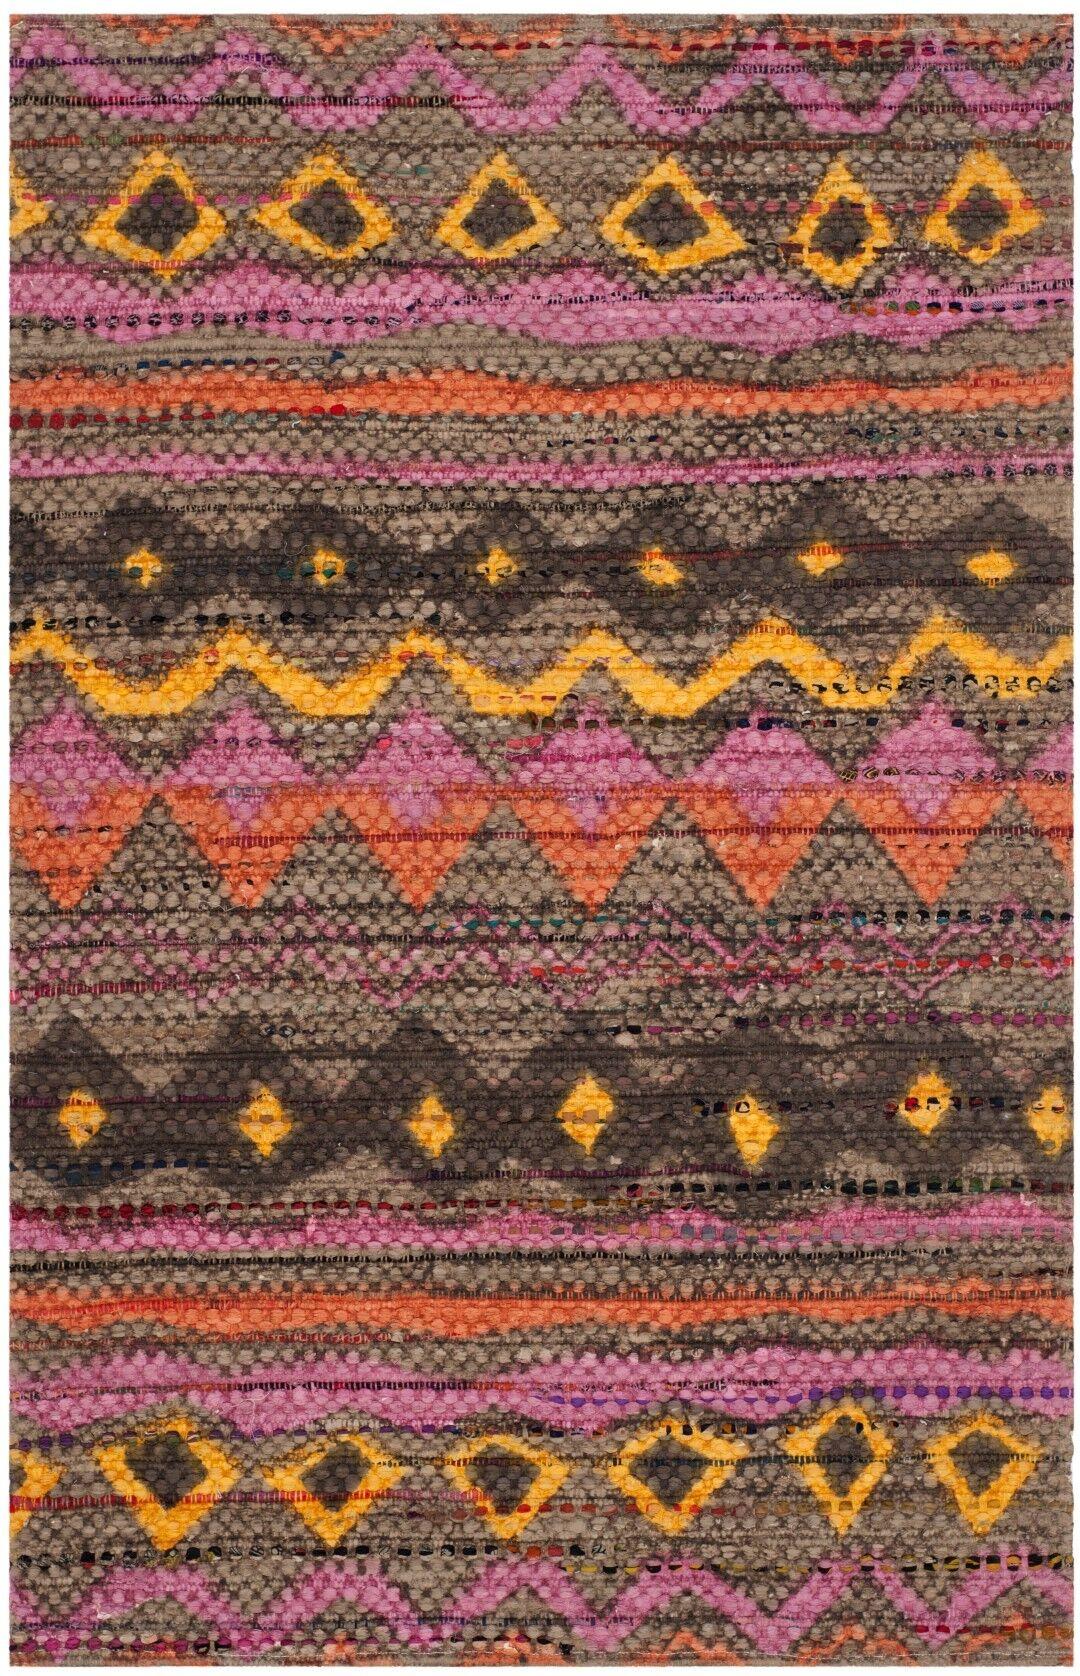 Veropeso Hand Woven Area Rug Rug Size: Rectangle 5' x 8'